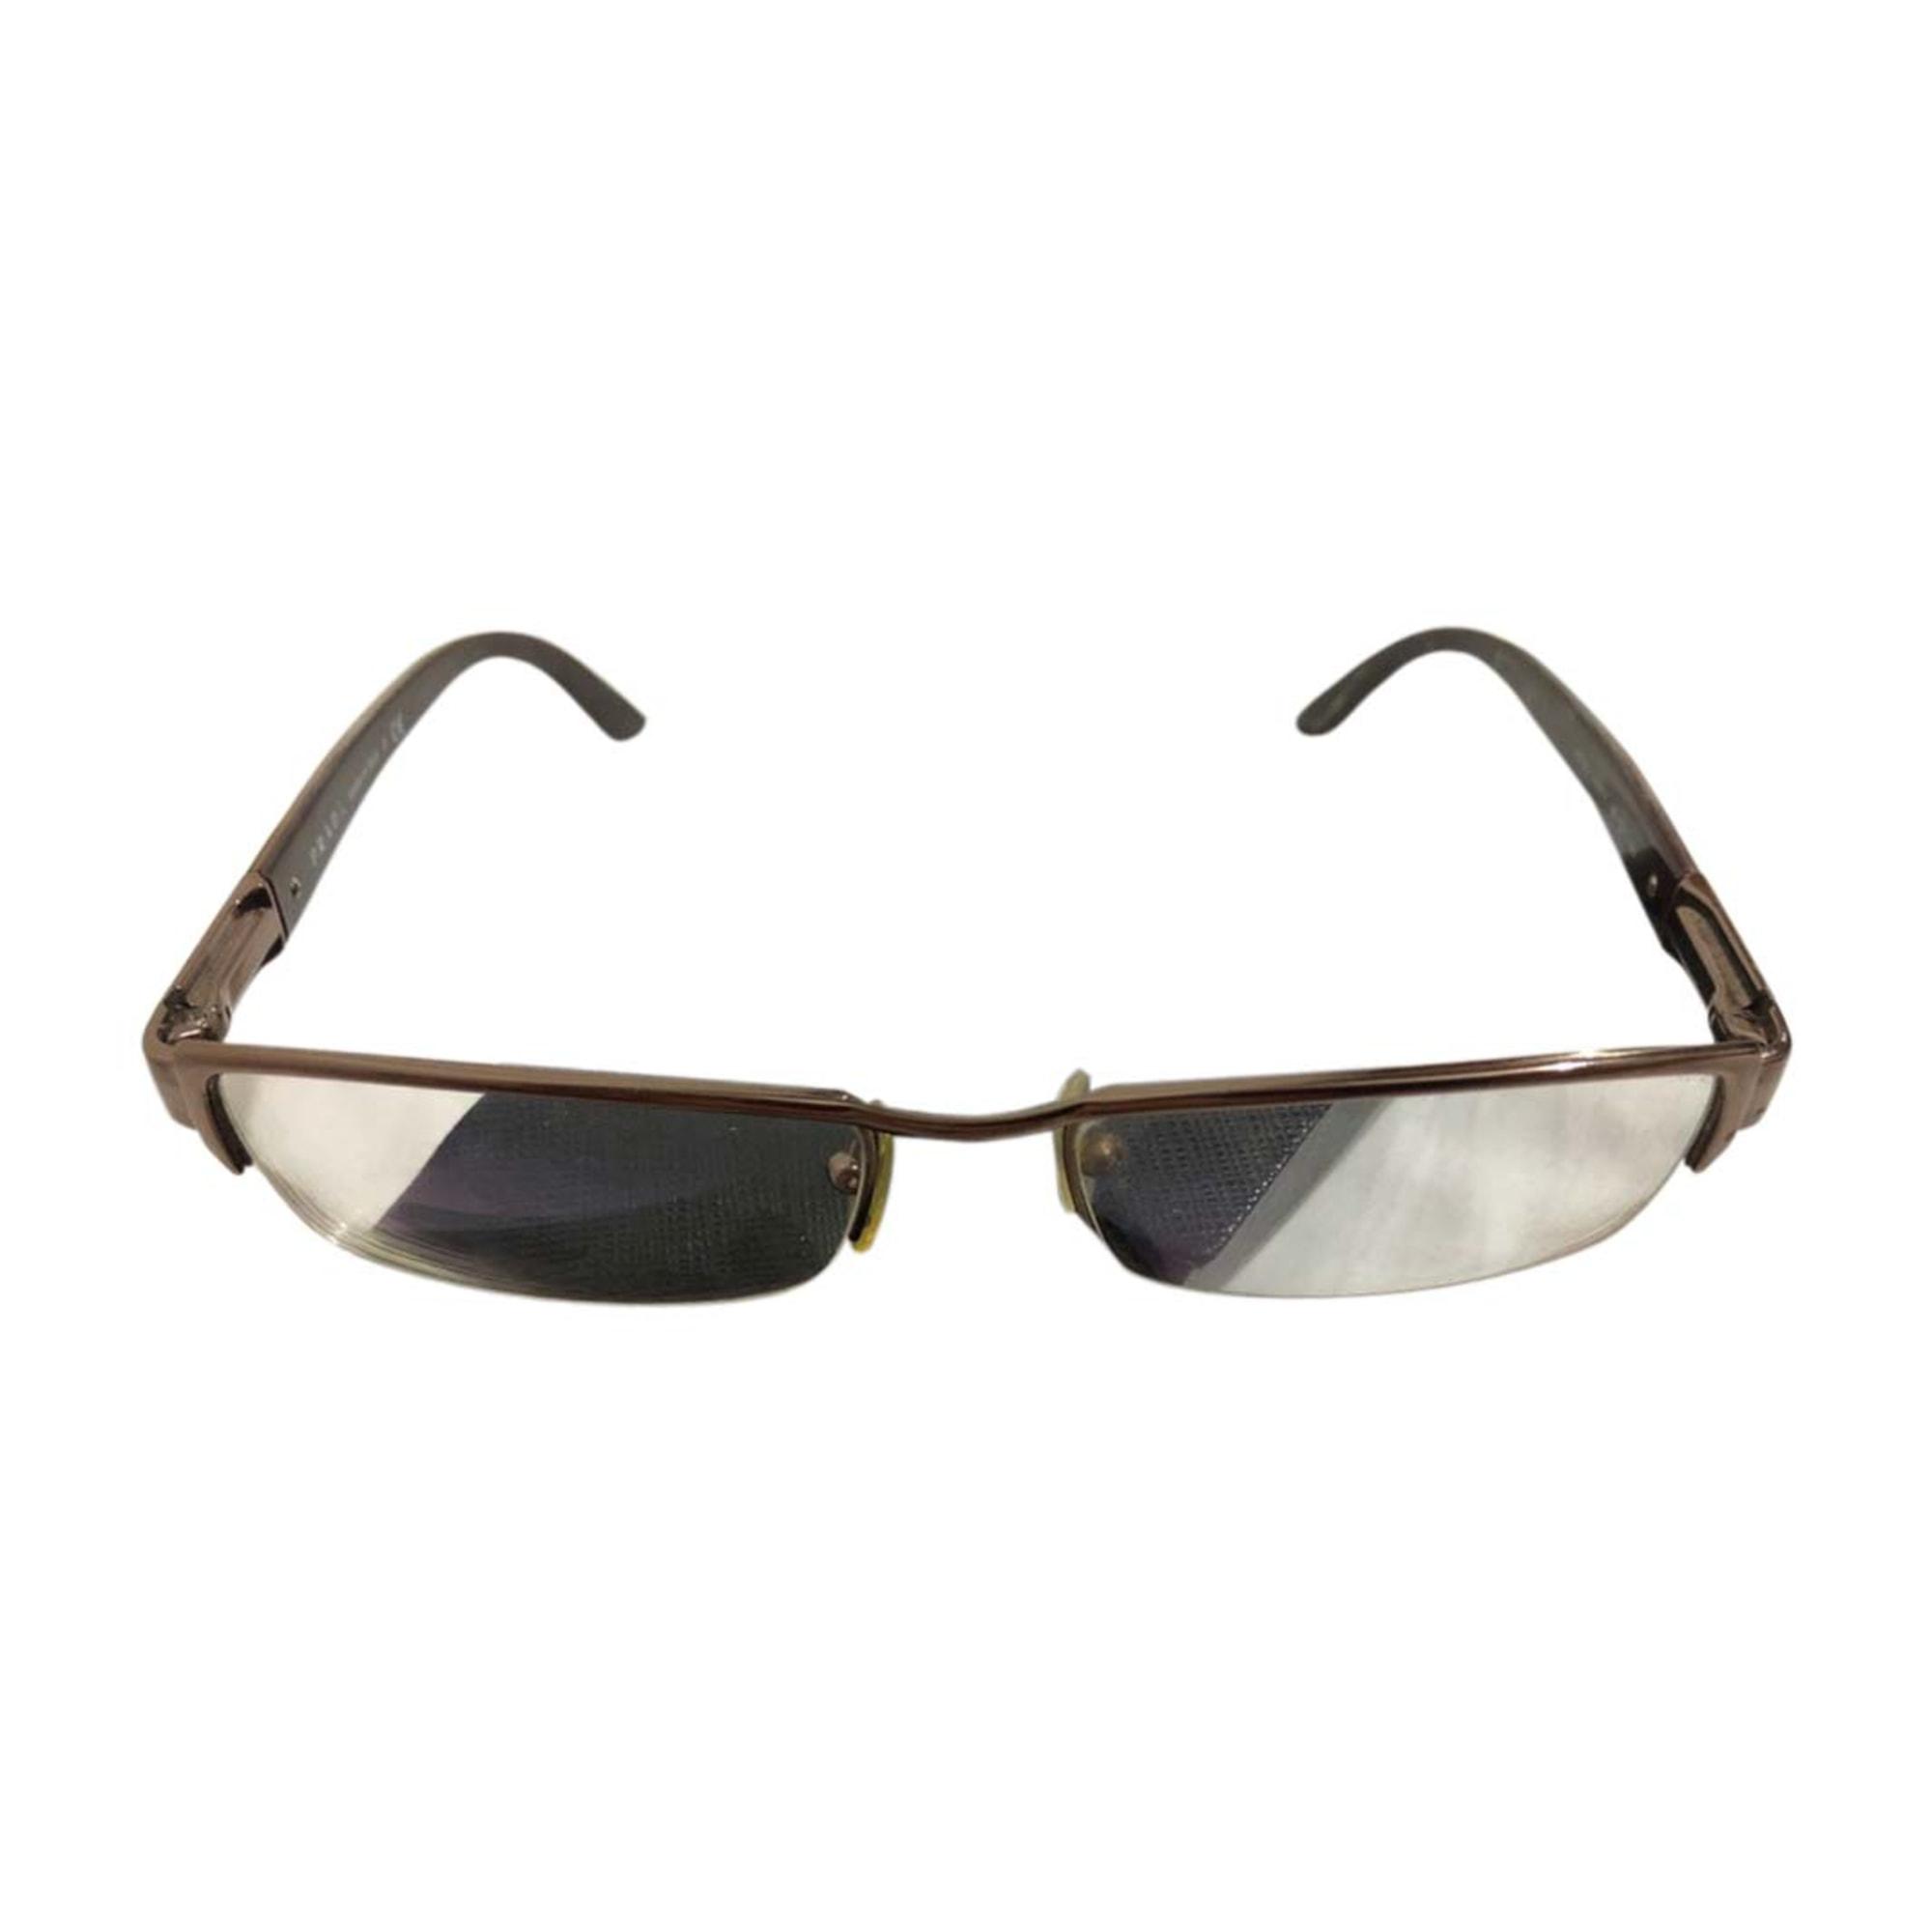 Eyeglass Frames PRADA Beige, camel